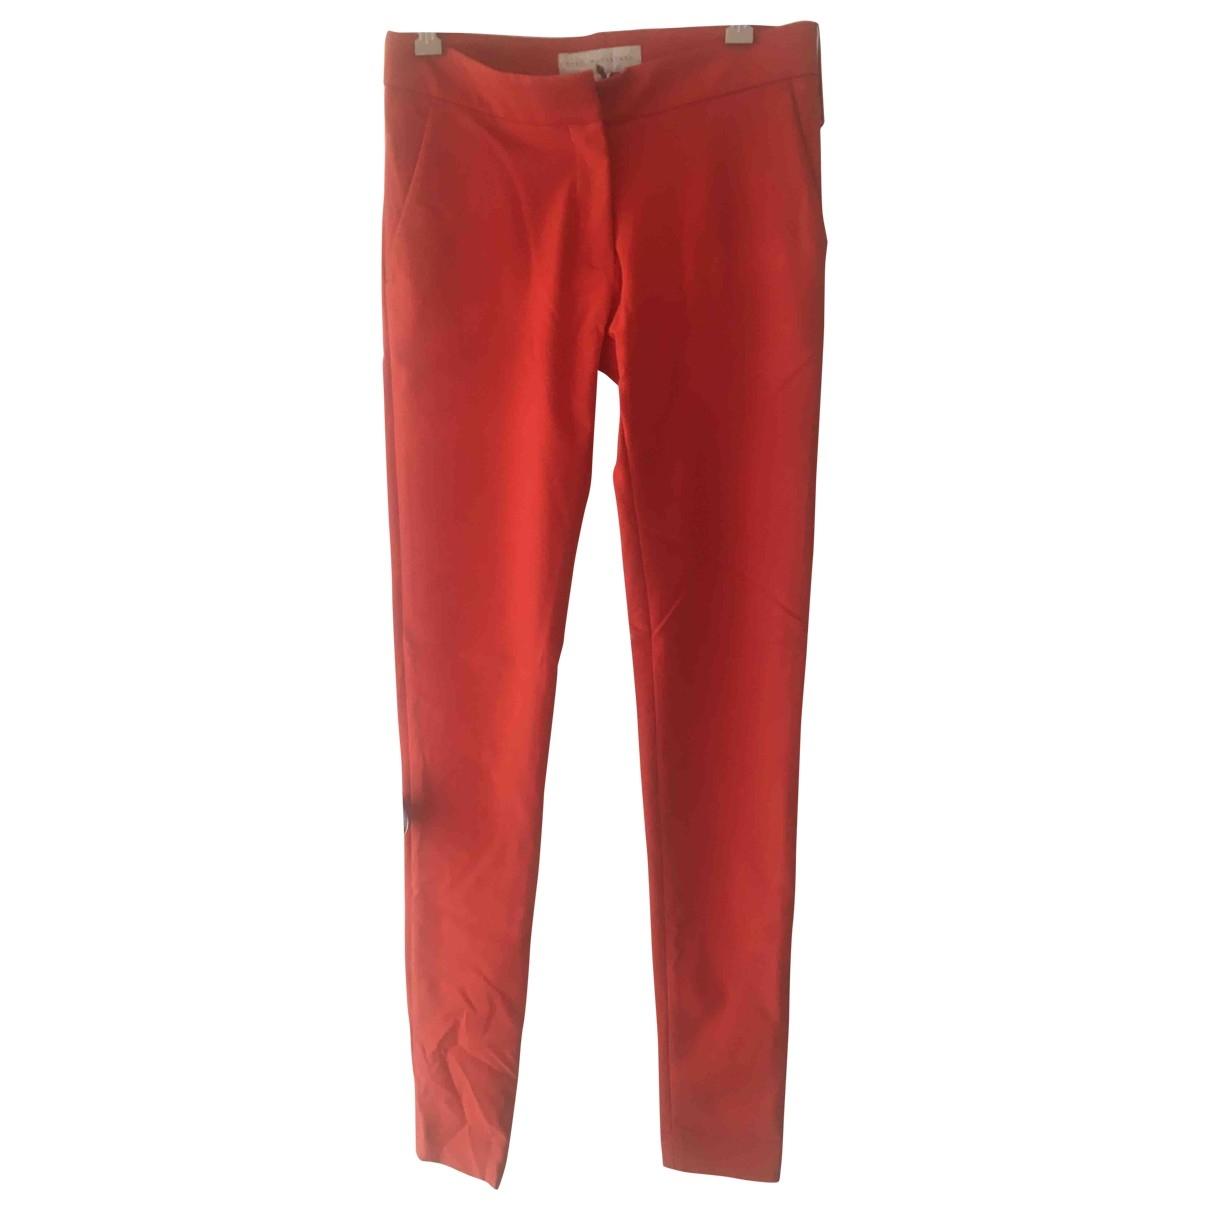 Stella Mccartney \N Red Cotton Trousers for Women 40 IT